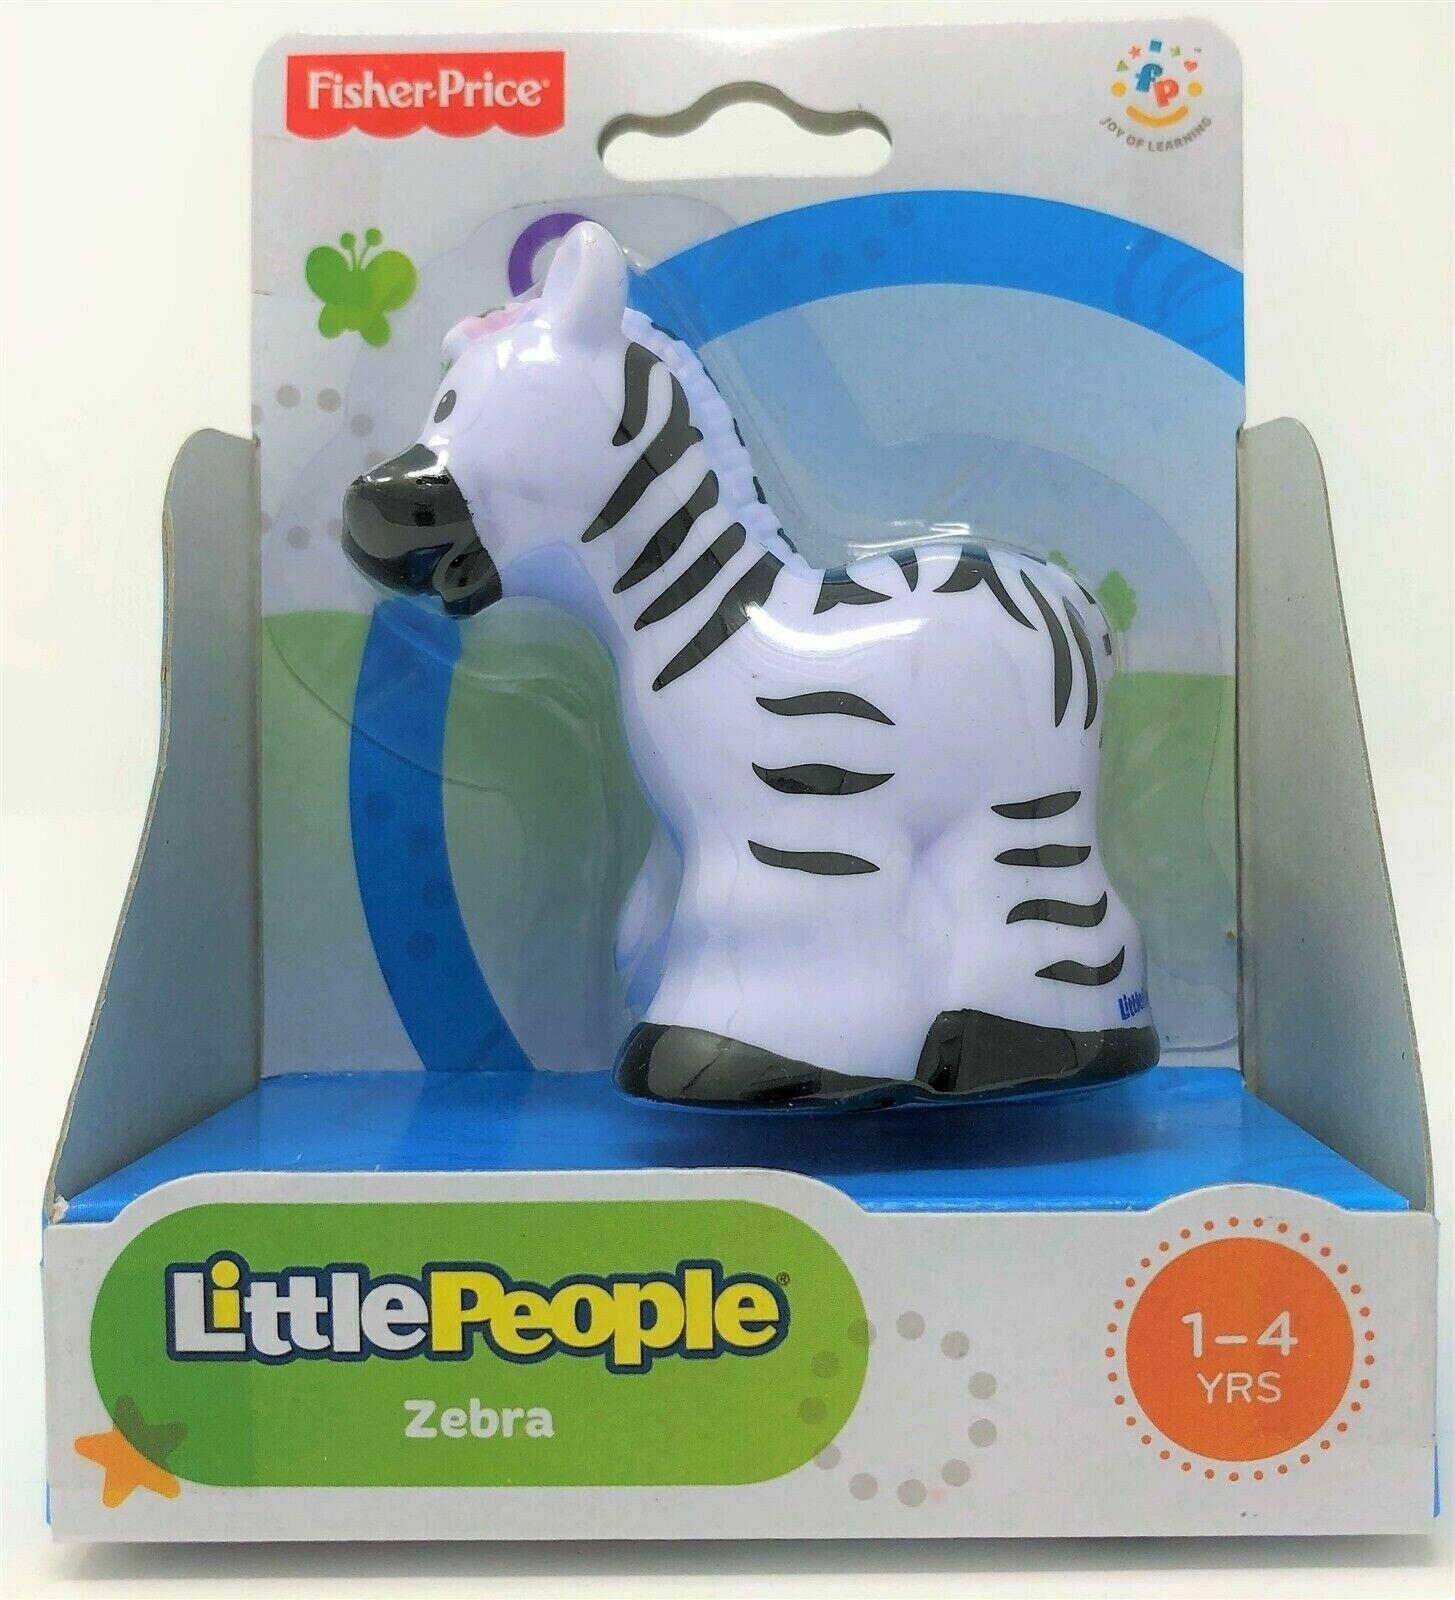 Fisher-Price Little People Zebra Tier Zoo Wildleben Safari Abbildung Spielzeug